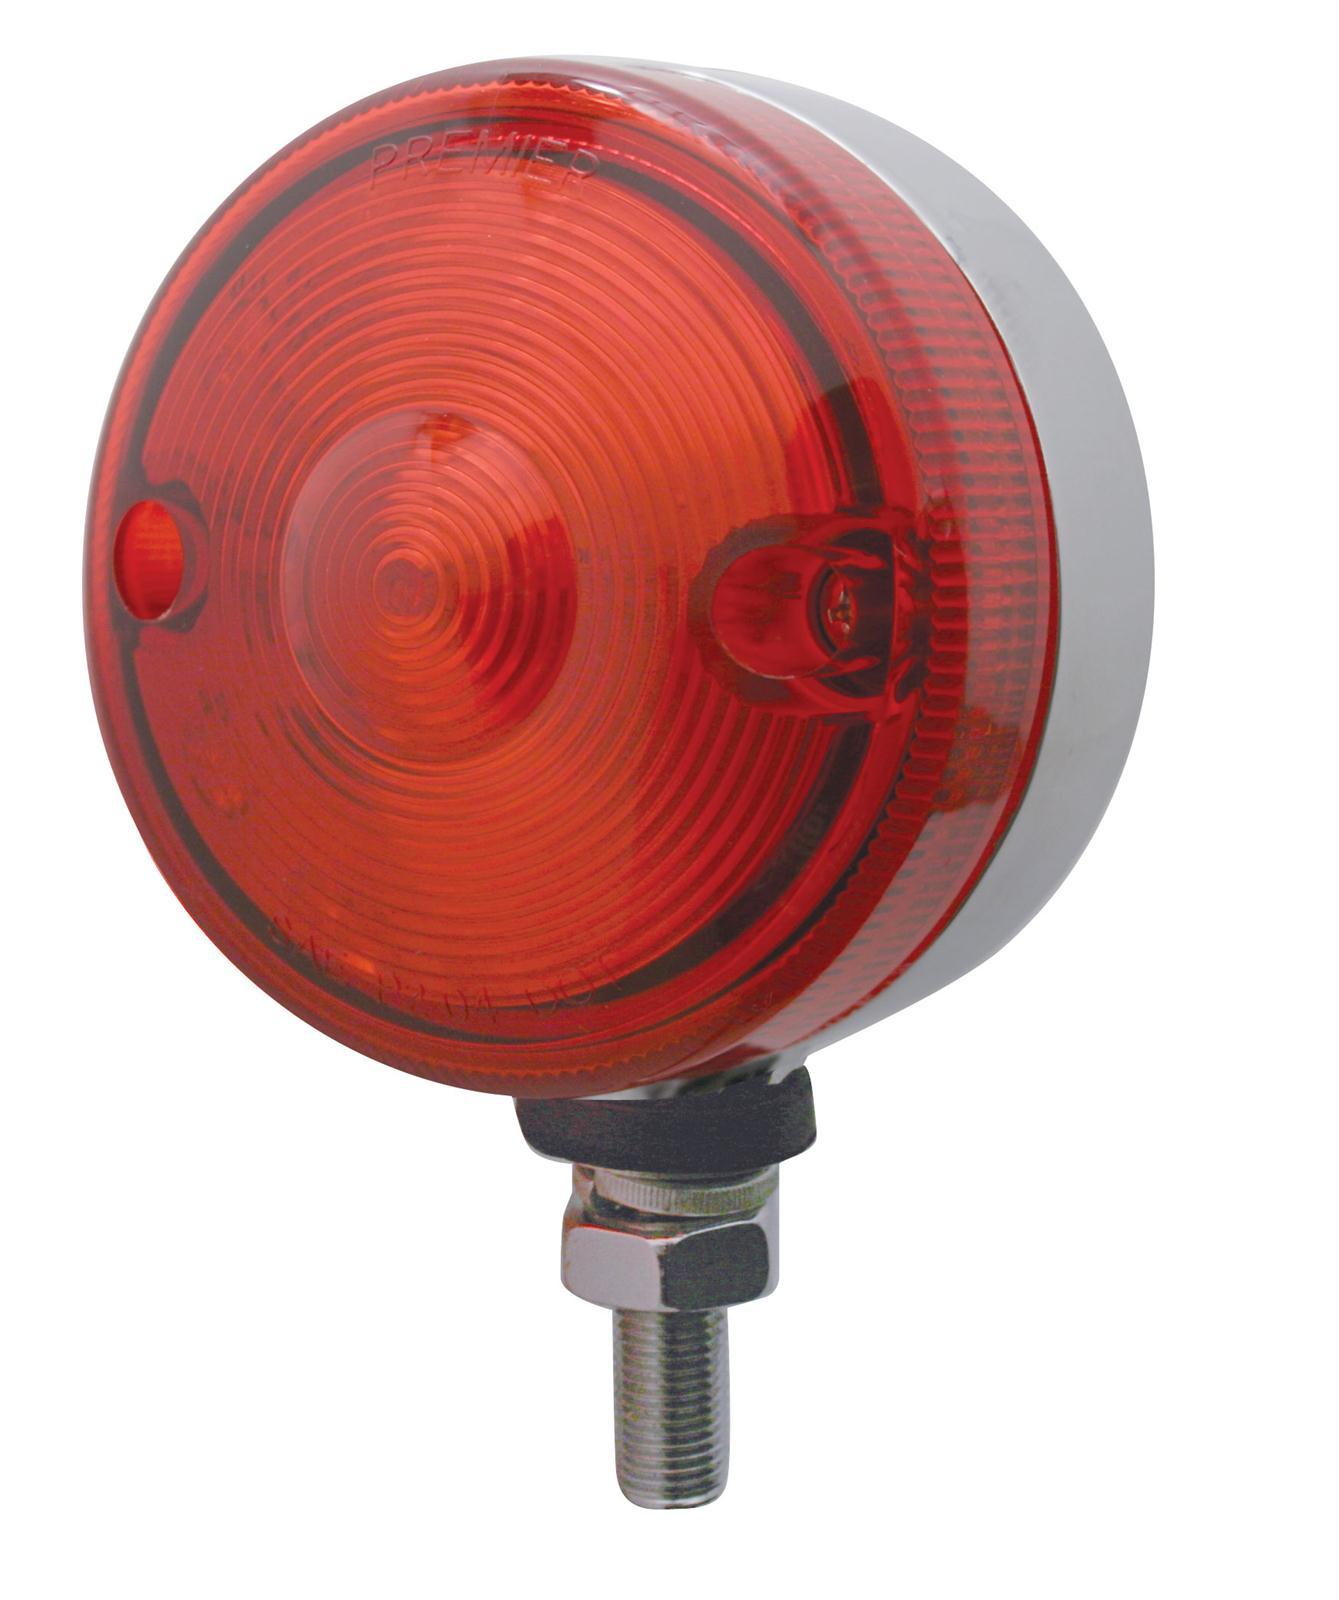 United Pacific Led Auxiliary Light 38854 Ebay